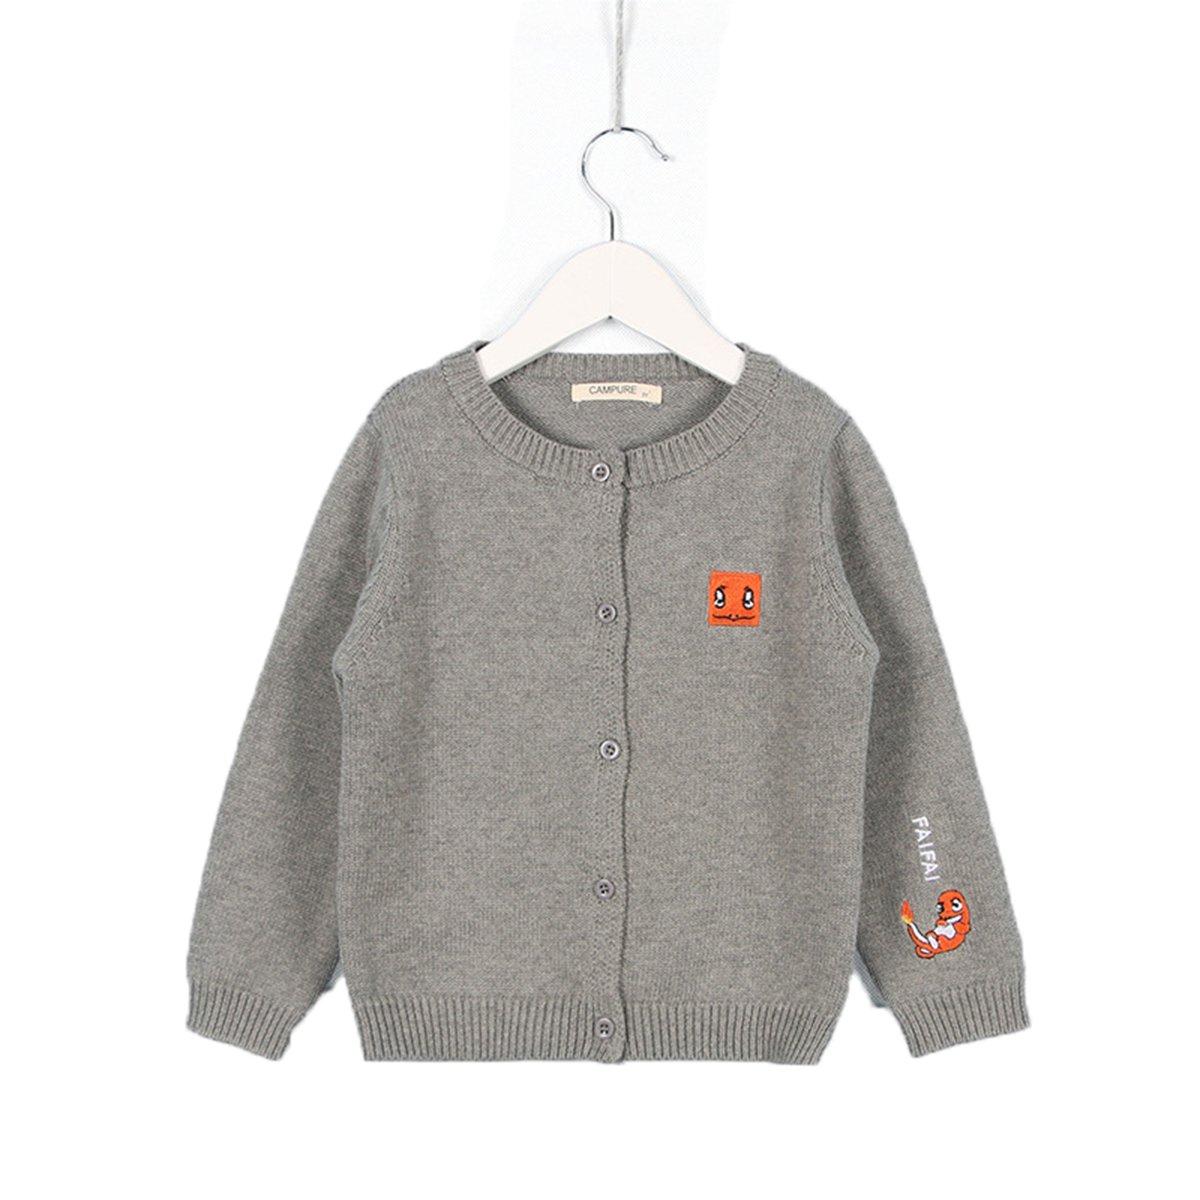 Lemonkid Trendy Unisex Kids Cotton Thicken Cartoon Pokemon Cardigan Sweater Coat 80cm/fit 12-18 Months